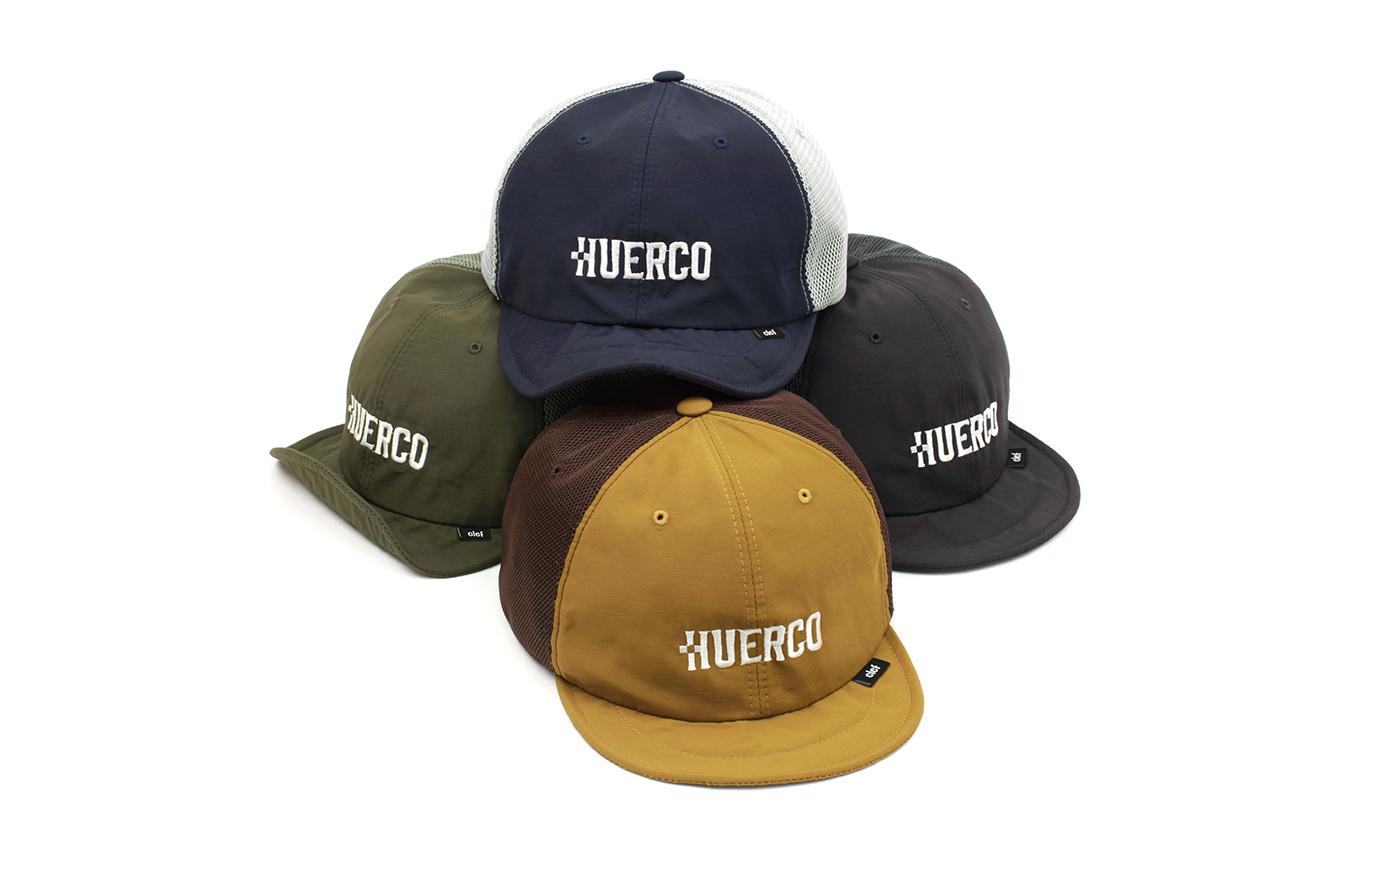 Huerco×Clef メッシュ B.CAP